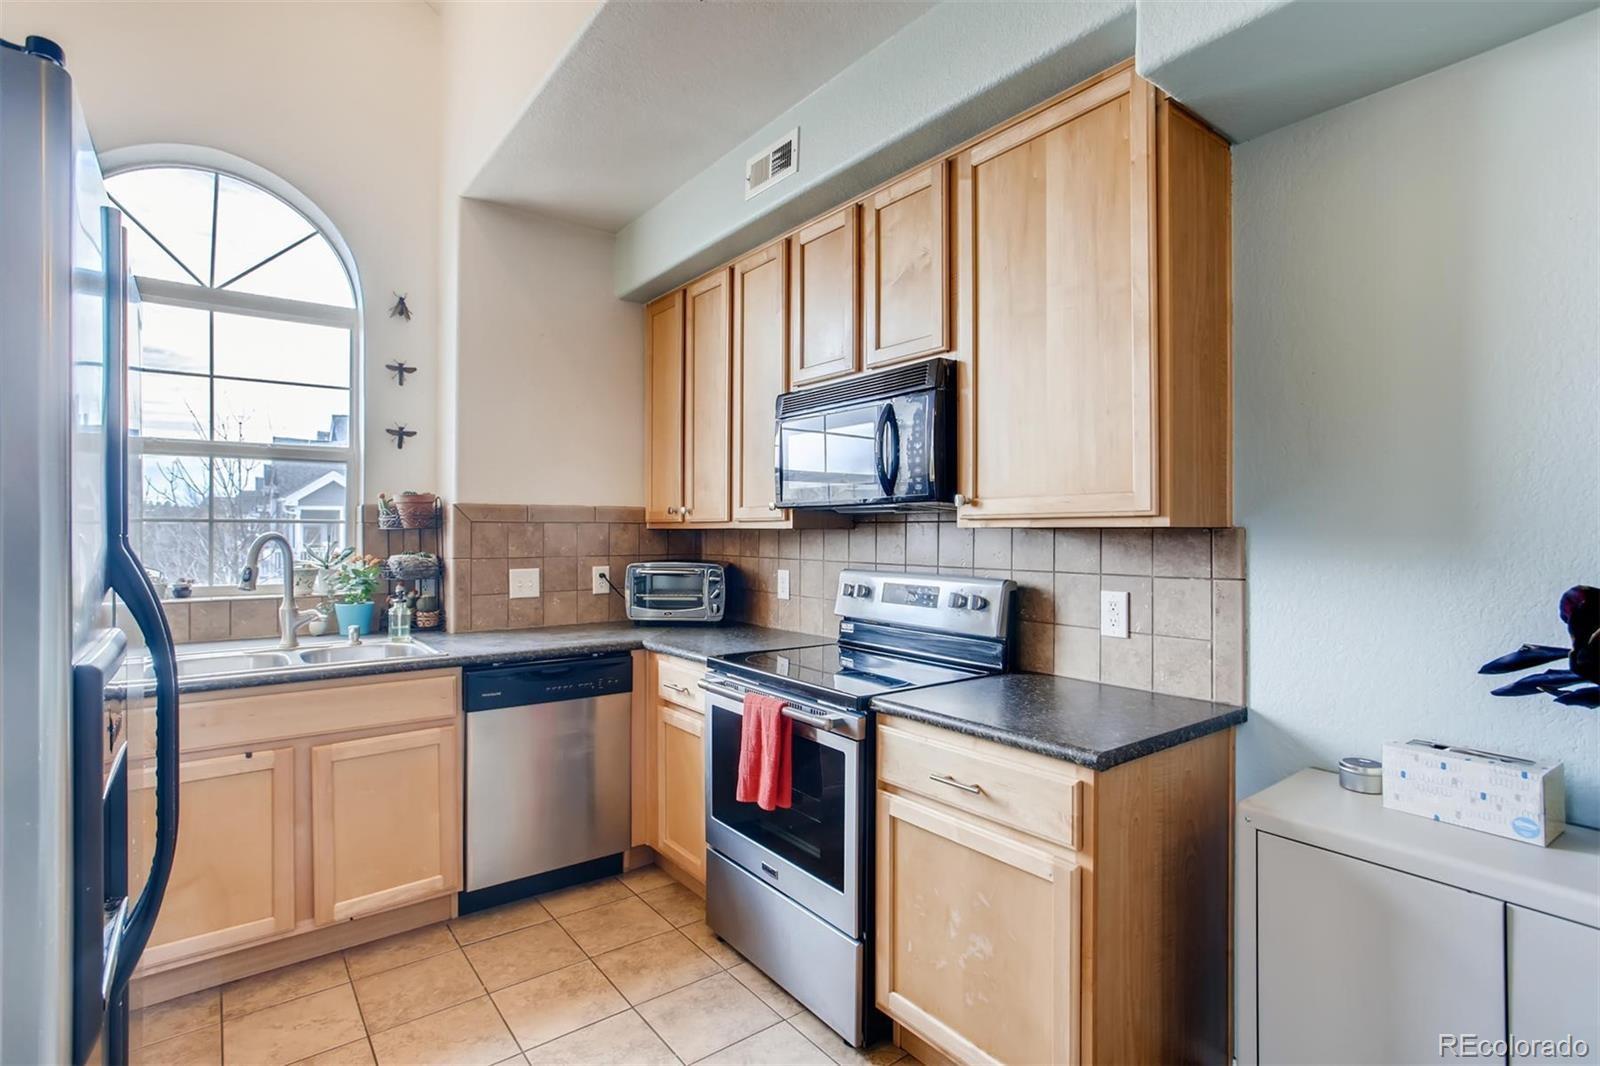 MLS# 6778844 - 7 - 16372 E Fremont Avenue #9, Aurora, CO 80016